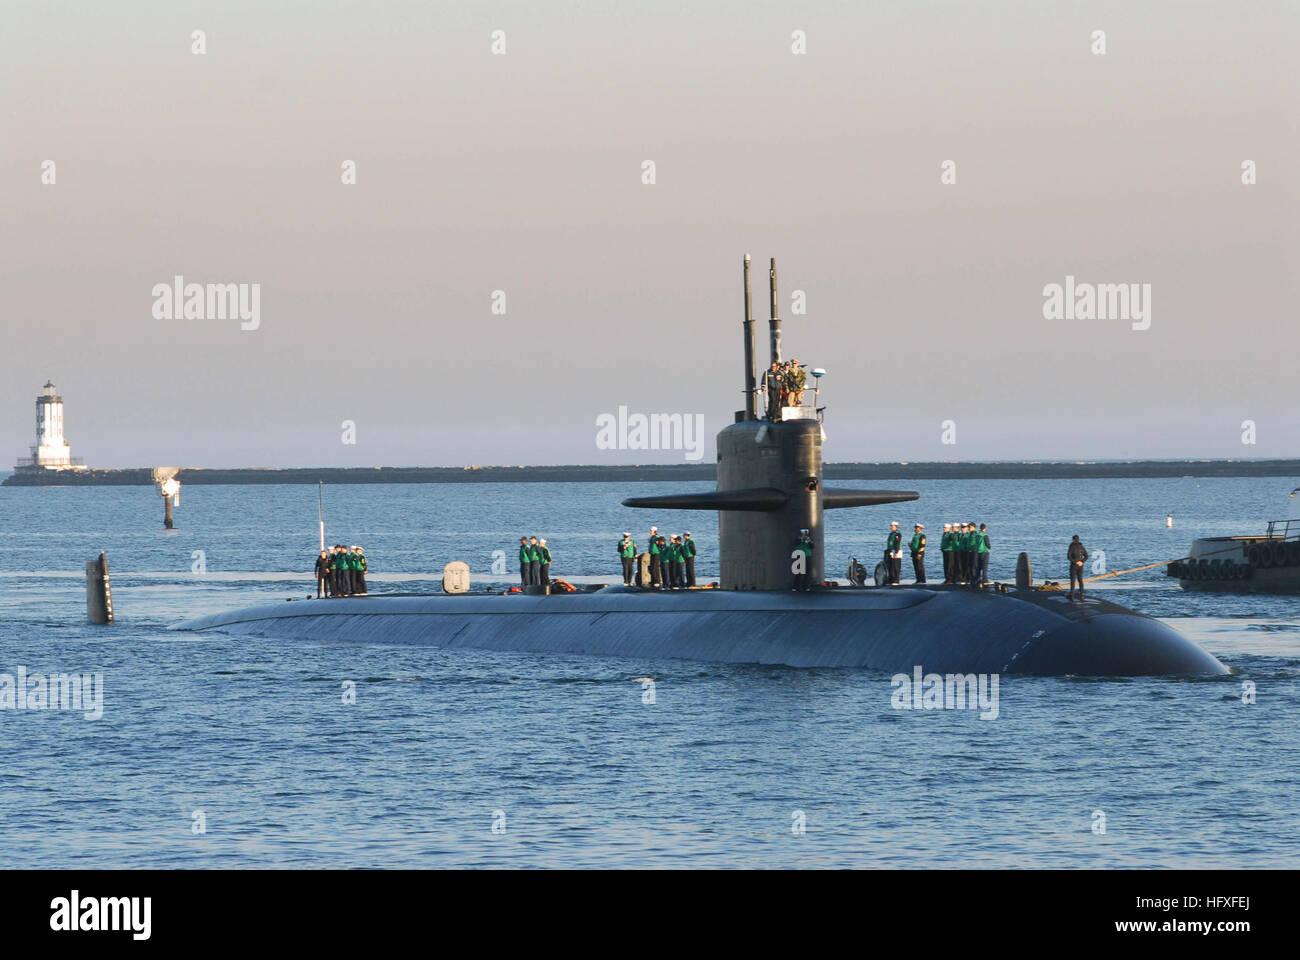 061207-N-6536T-045 San Pedro, Calif. (Dec. 7, 2006) - The fast attack submarine USS Los Angeles (SSN 688) pulls - Stock Image